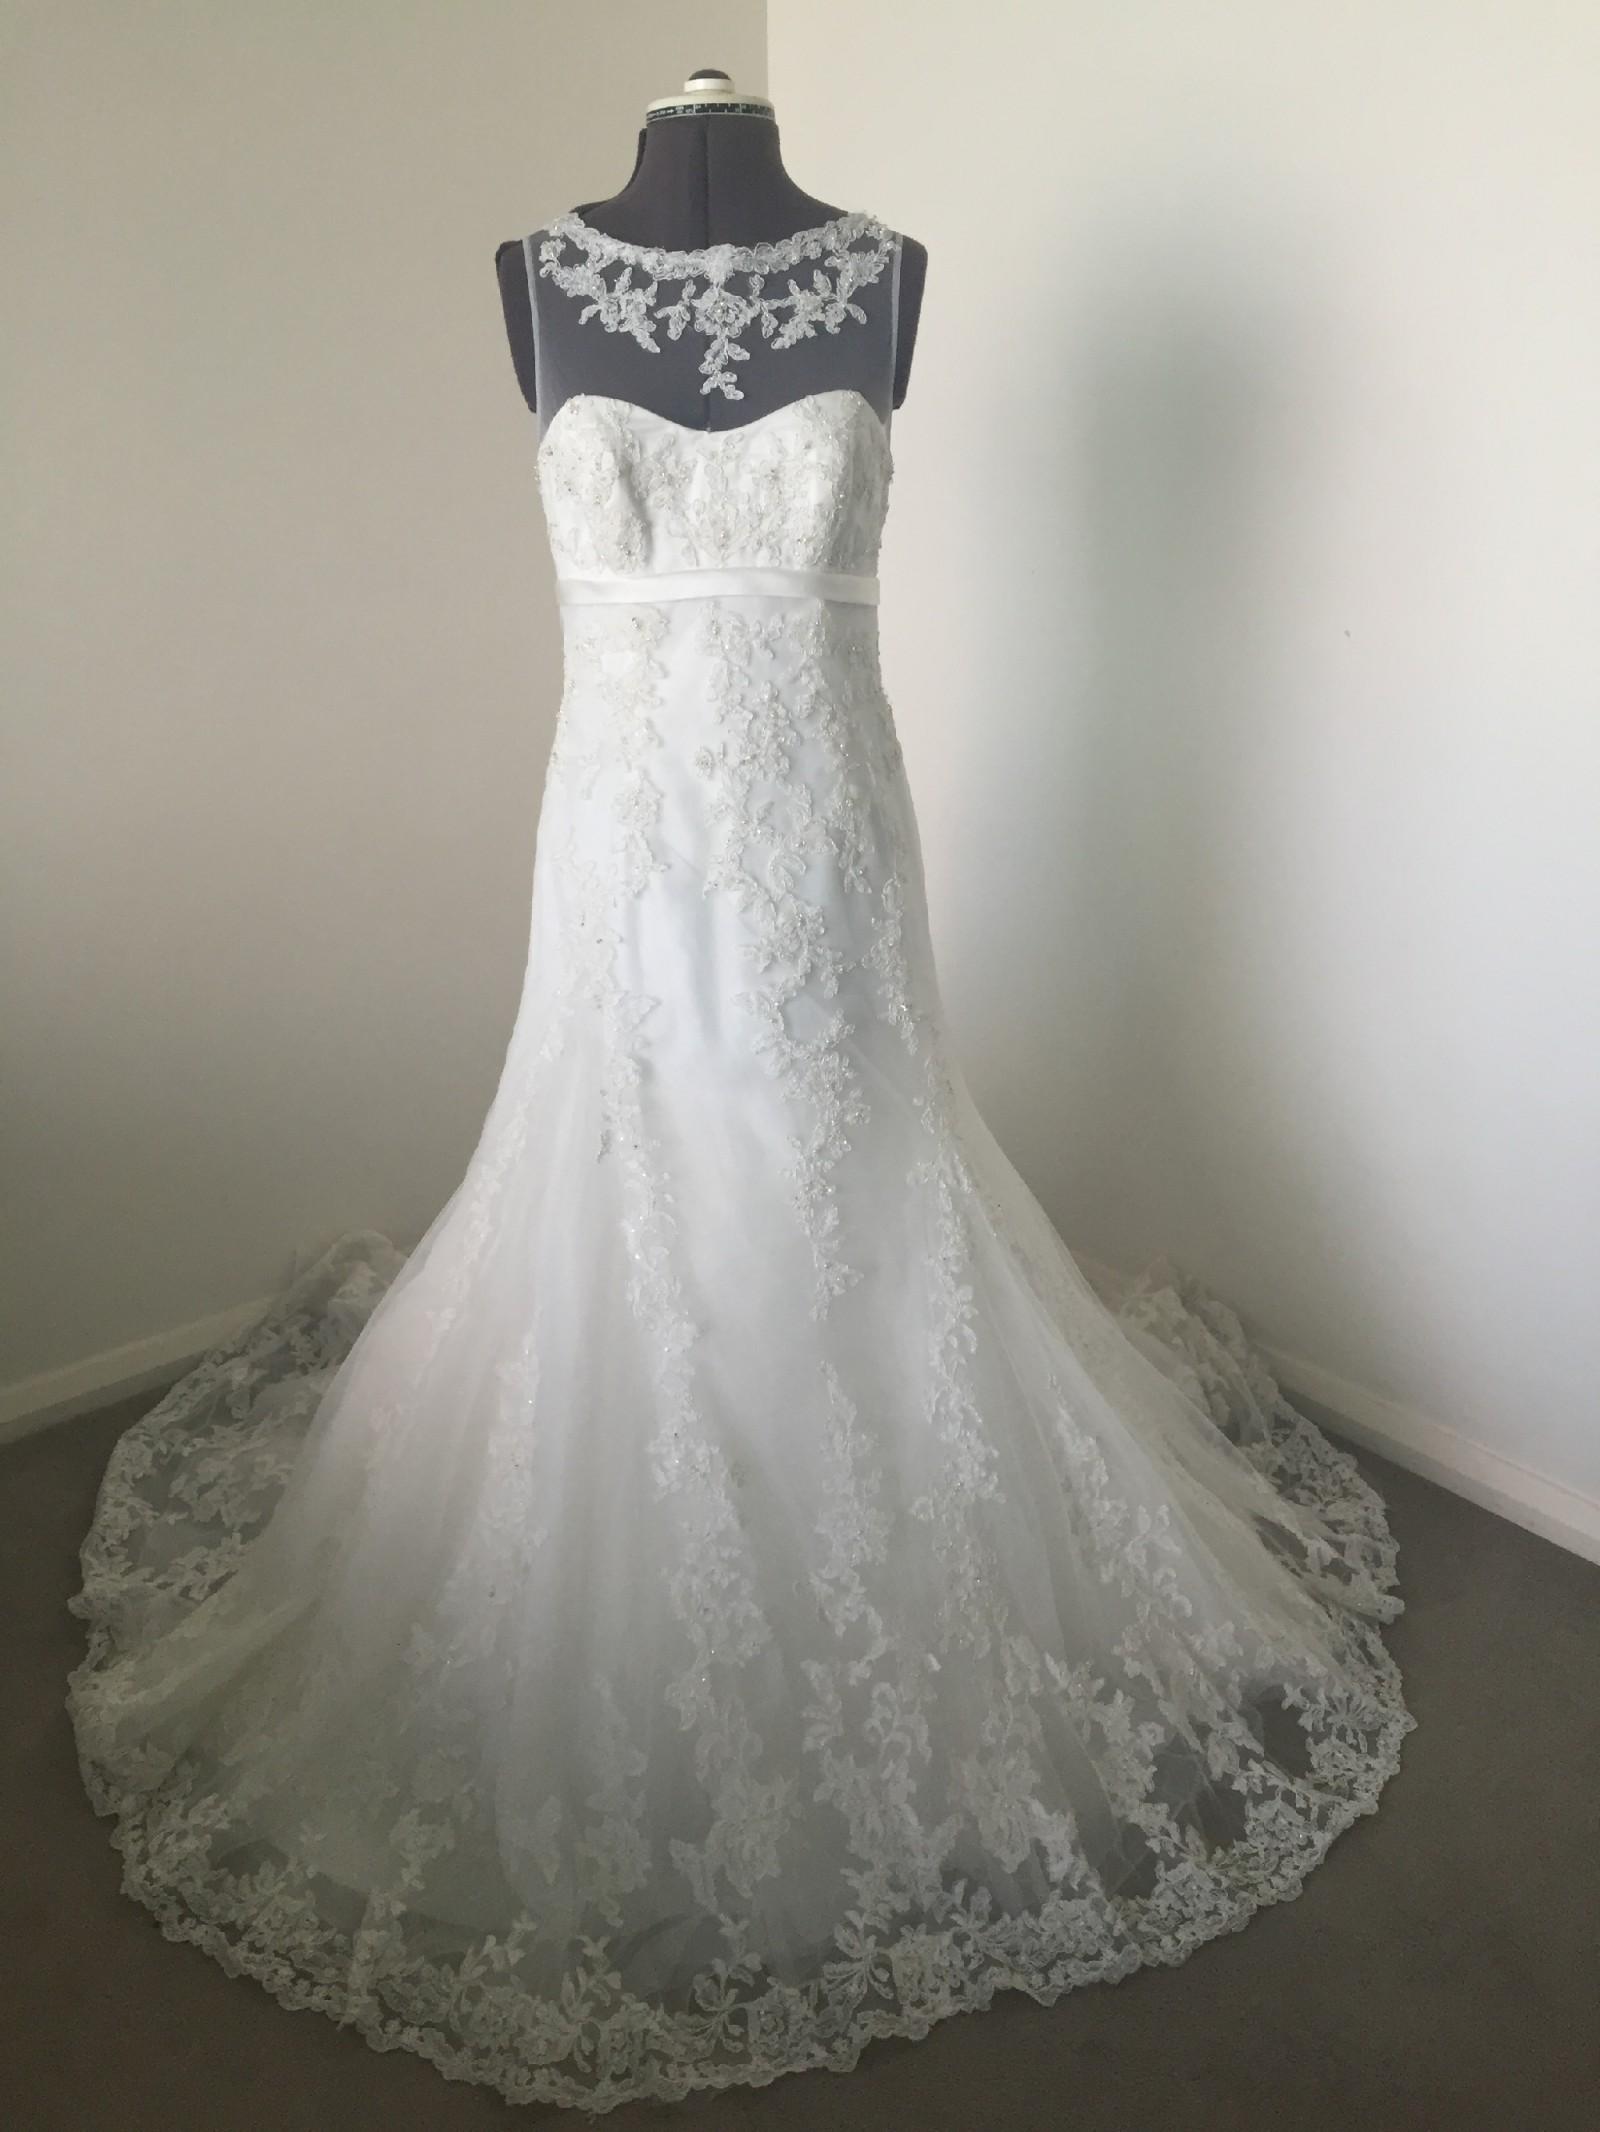 Used wedding dresses under 500 : Alfred angelo wedding dress on sale